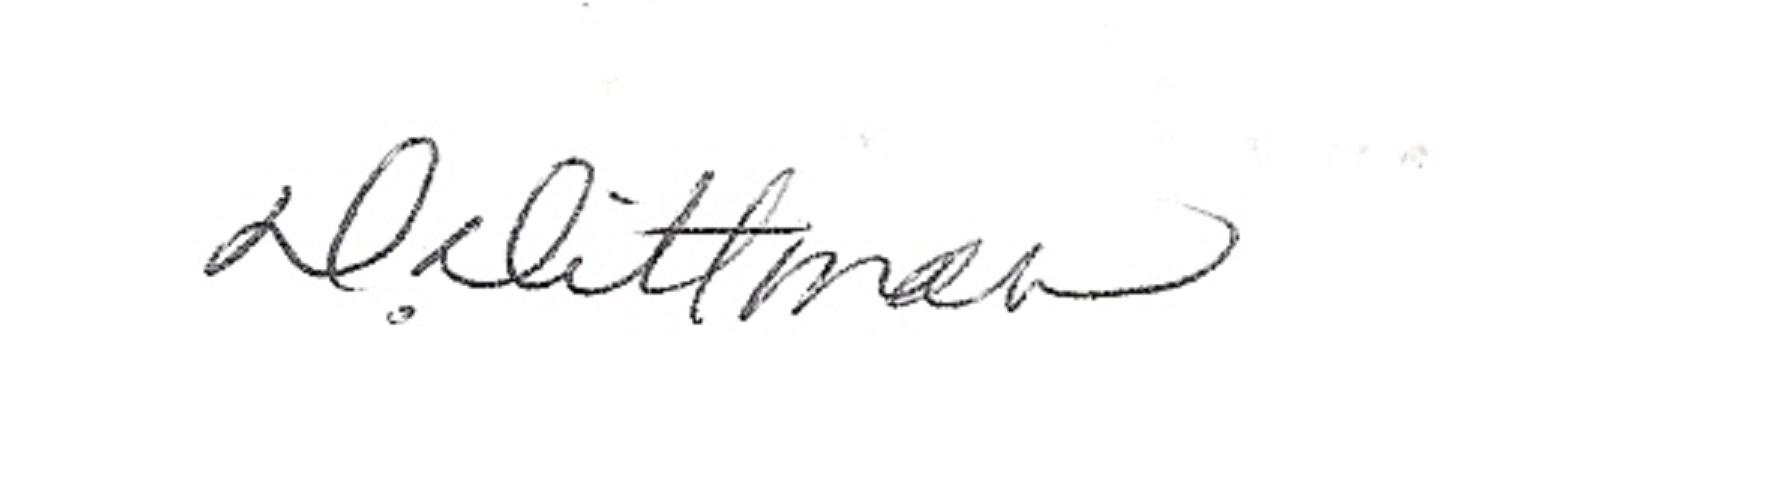 donna dittman's Signature